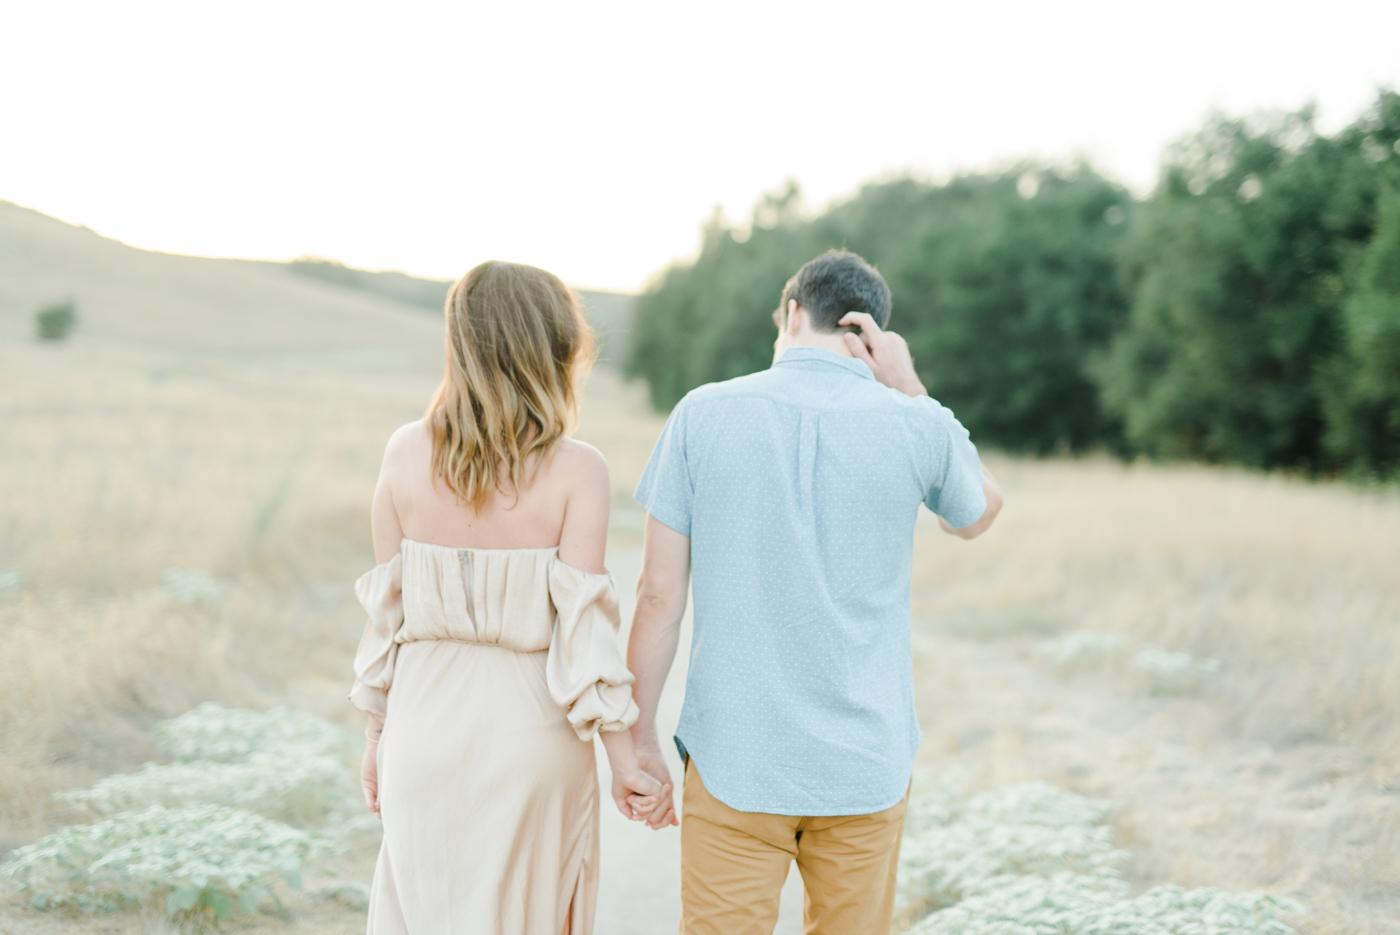 Malibu_Creek_State_Park_Romantic_Engagement_Session_C&J_romantic-14.jpg